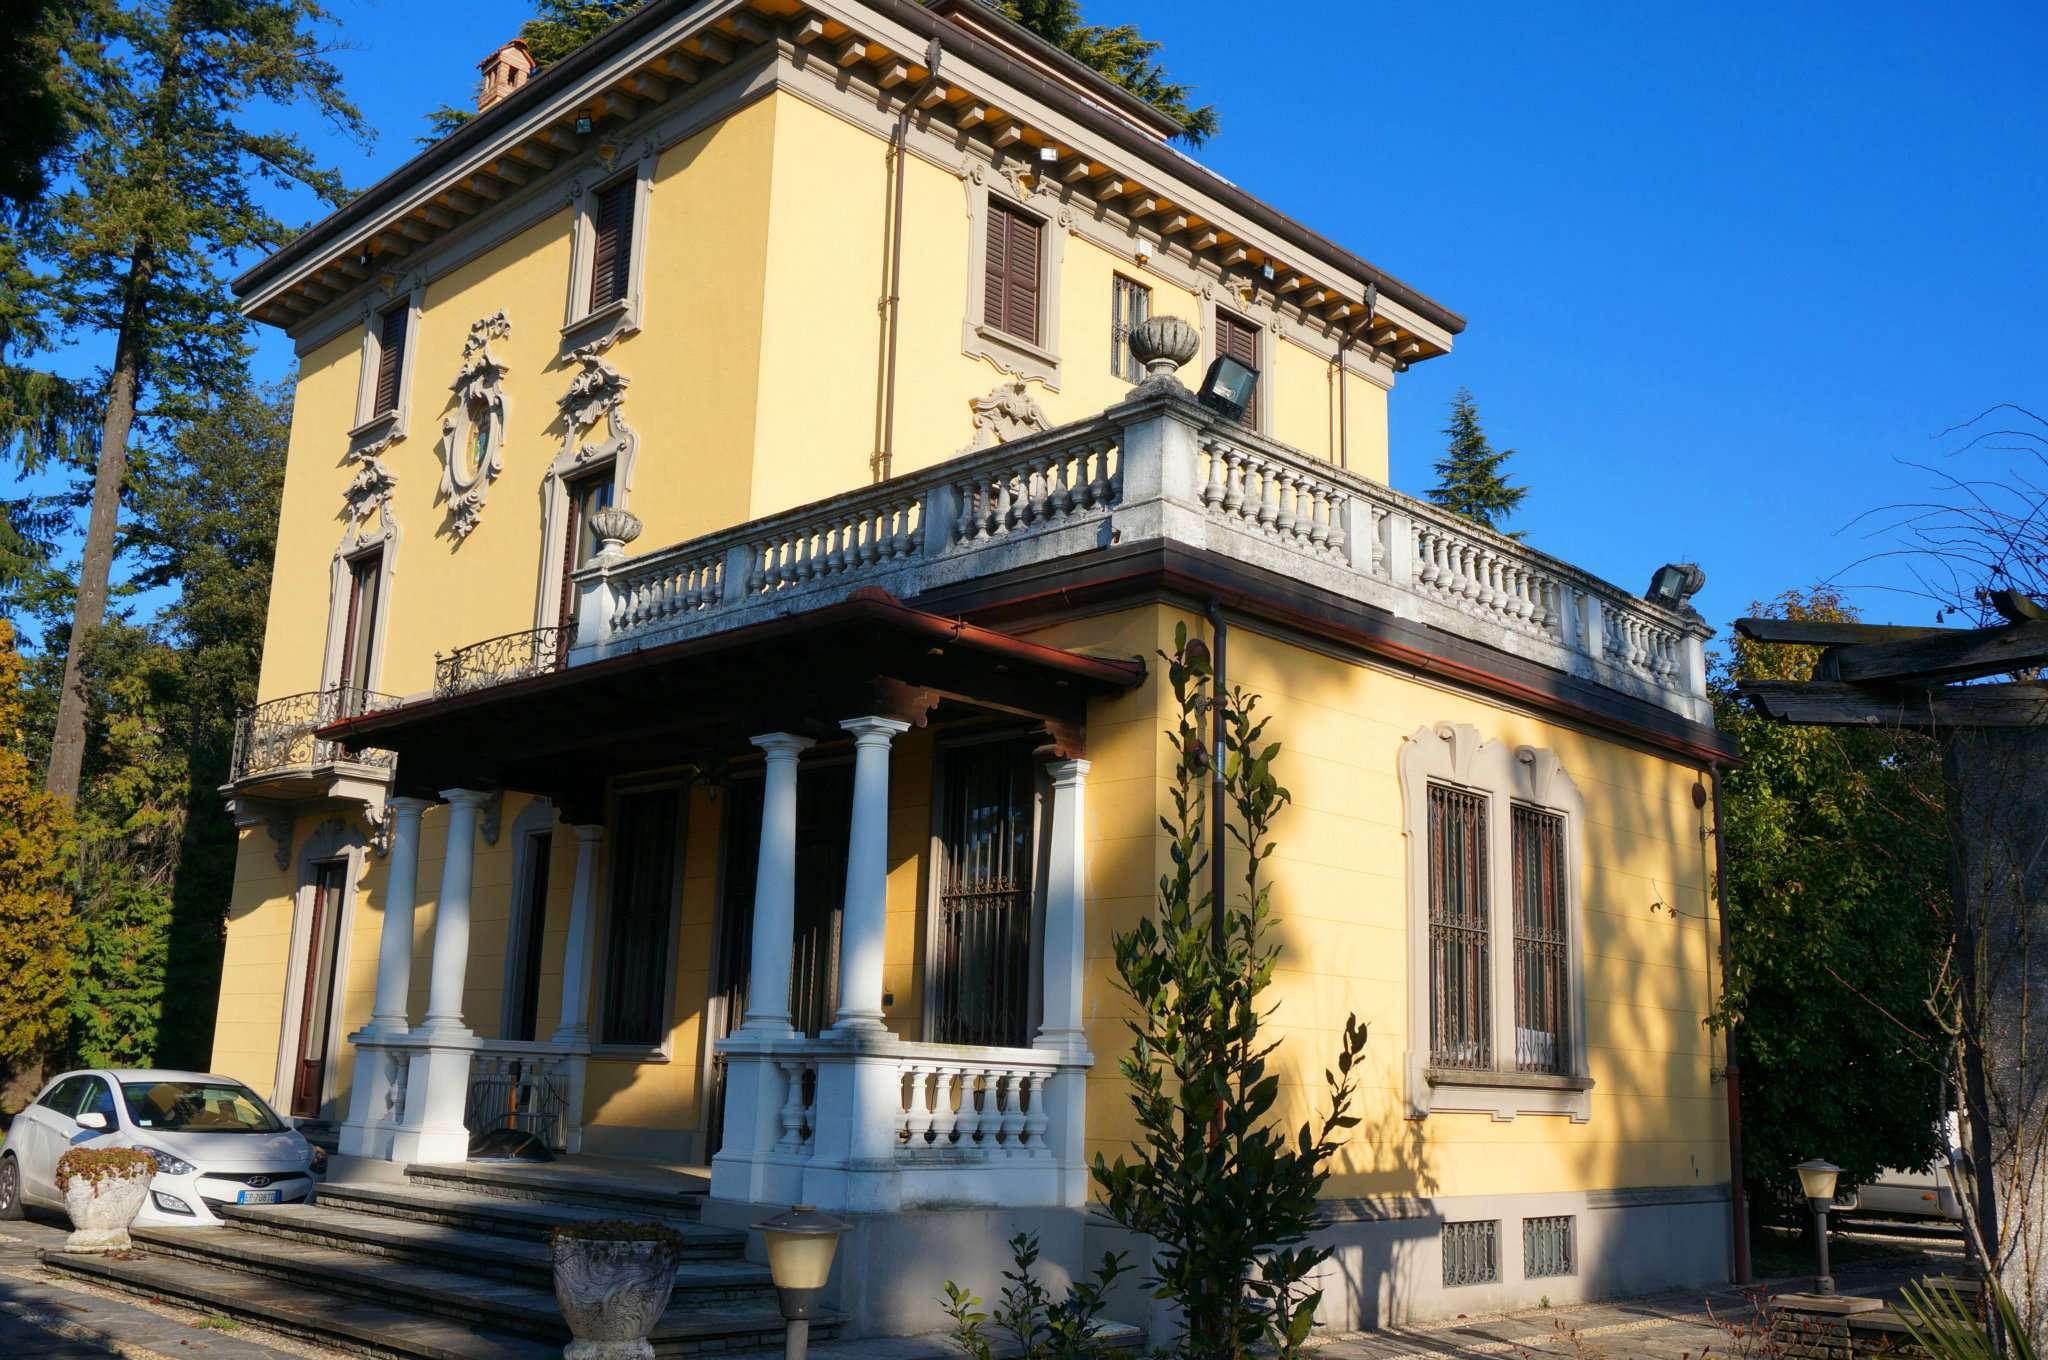 Villa in Vendita a Merate: 5 locali, 620 mq